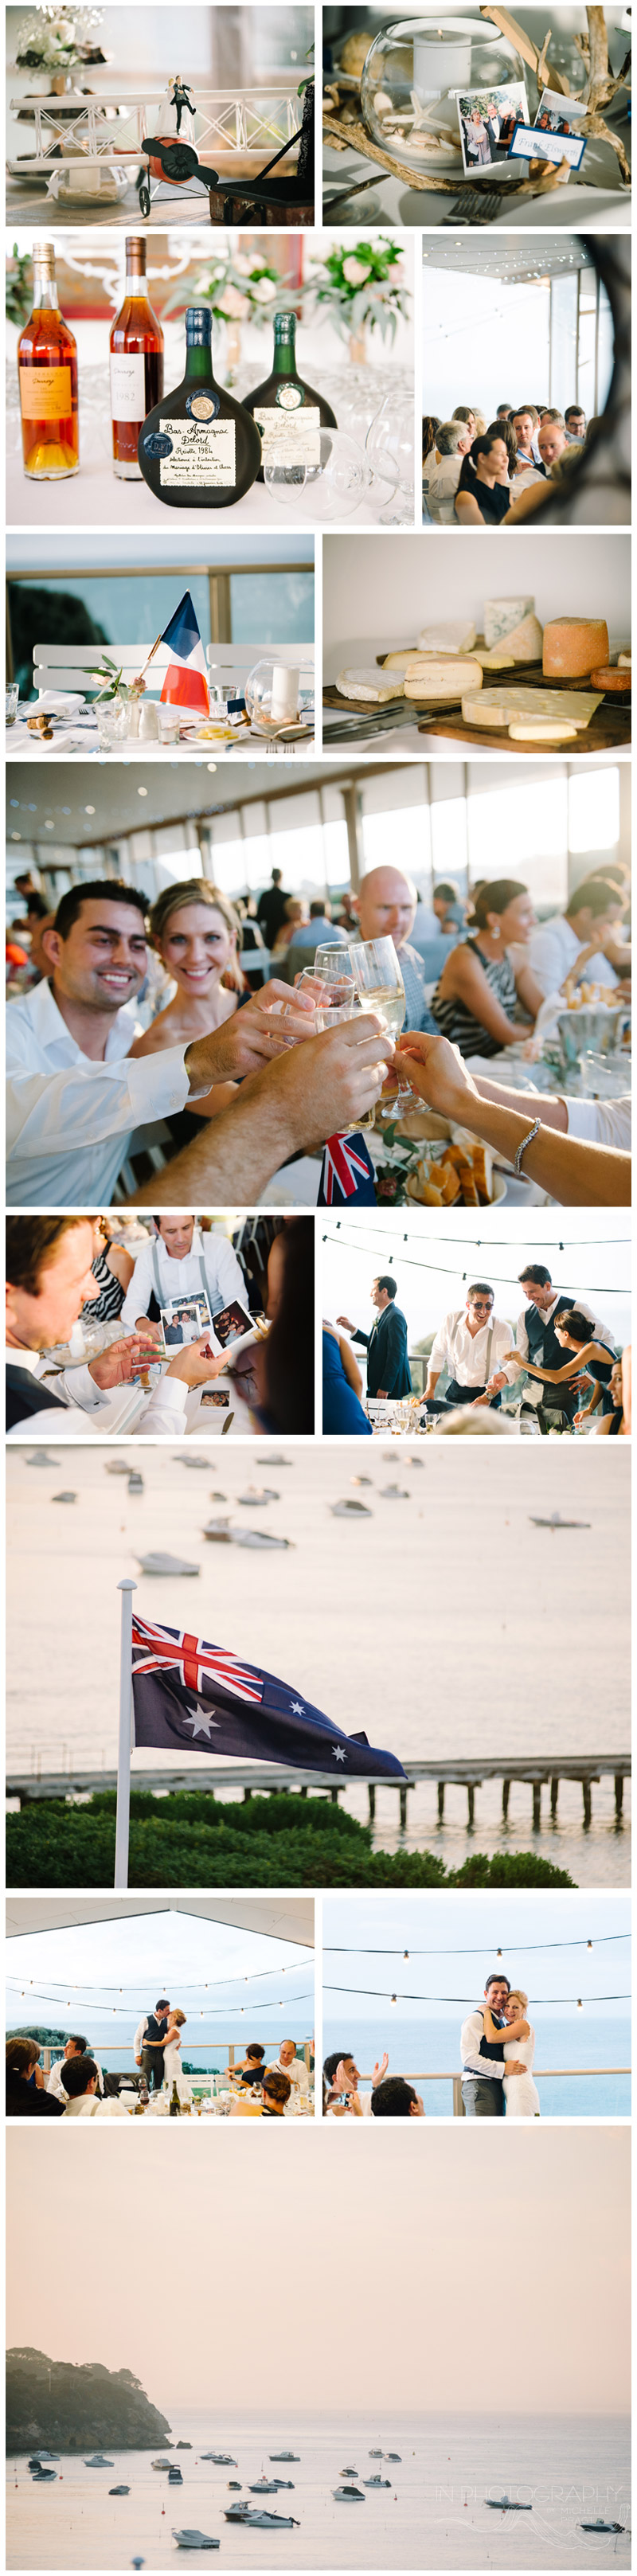 Mornington Peninsula wedding reception venue